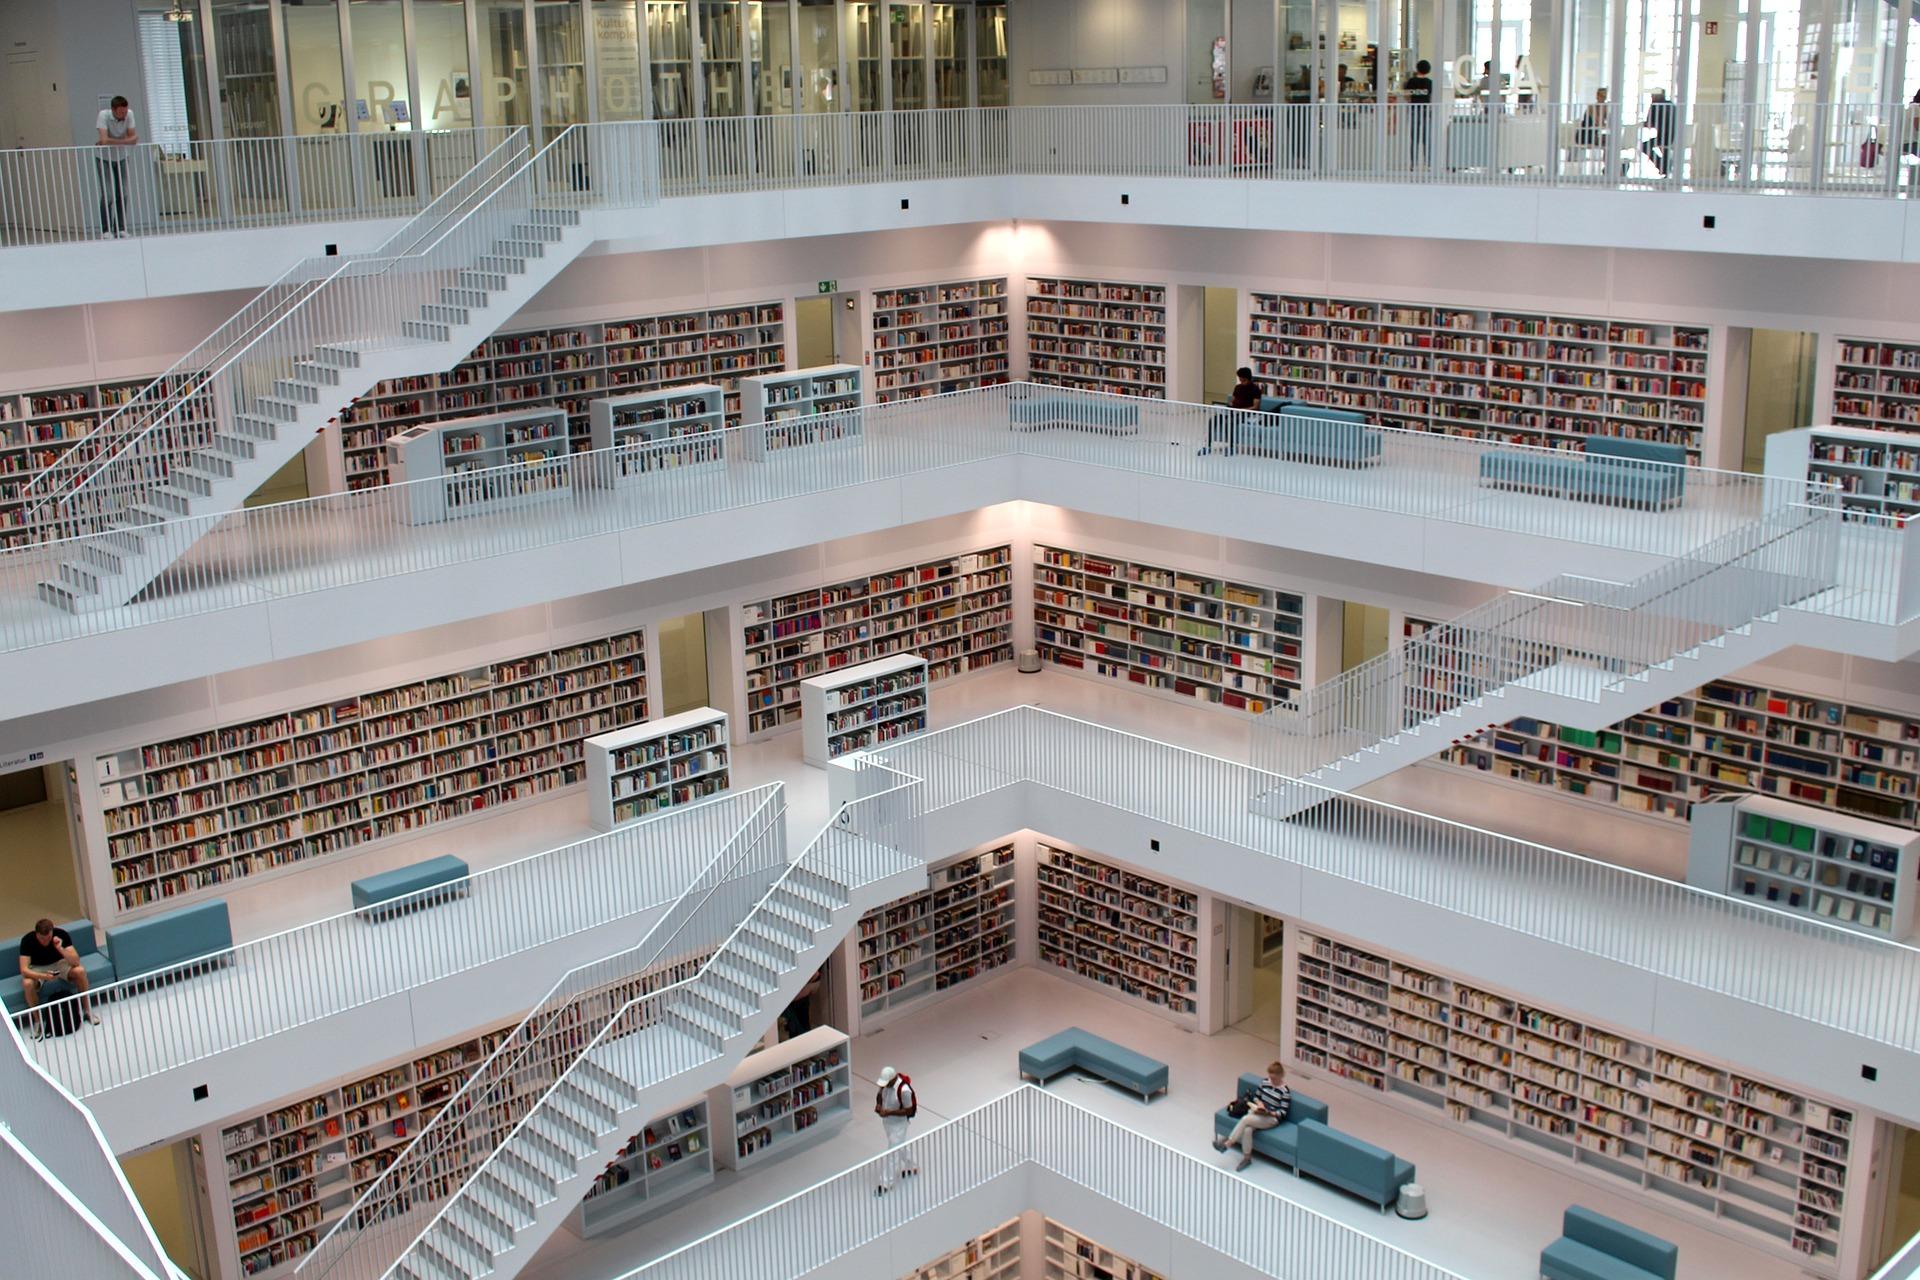 library-1700581_1920jpg